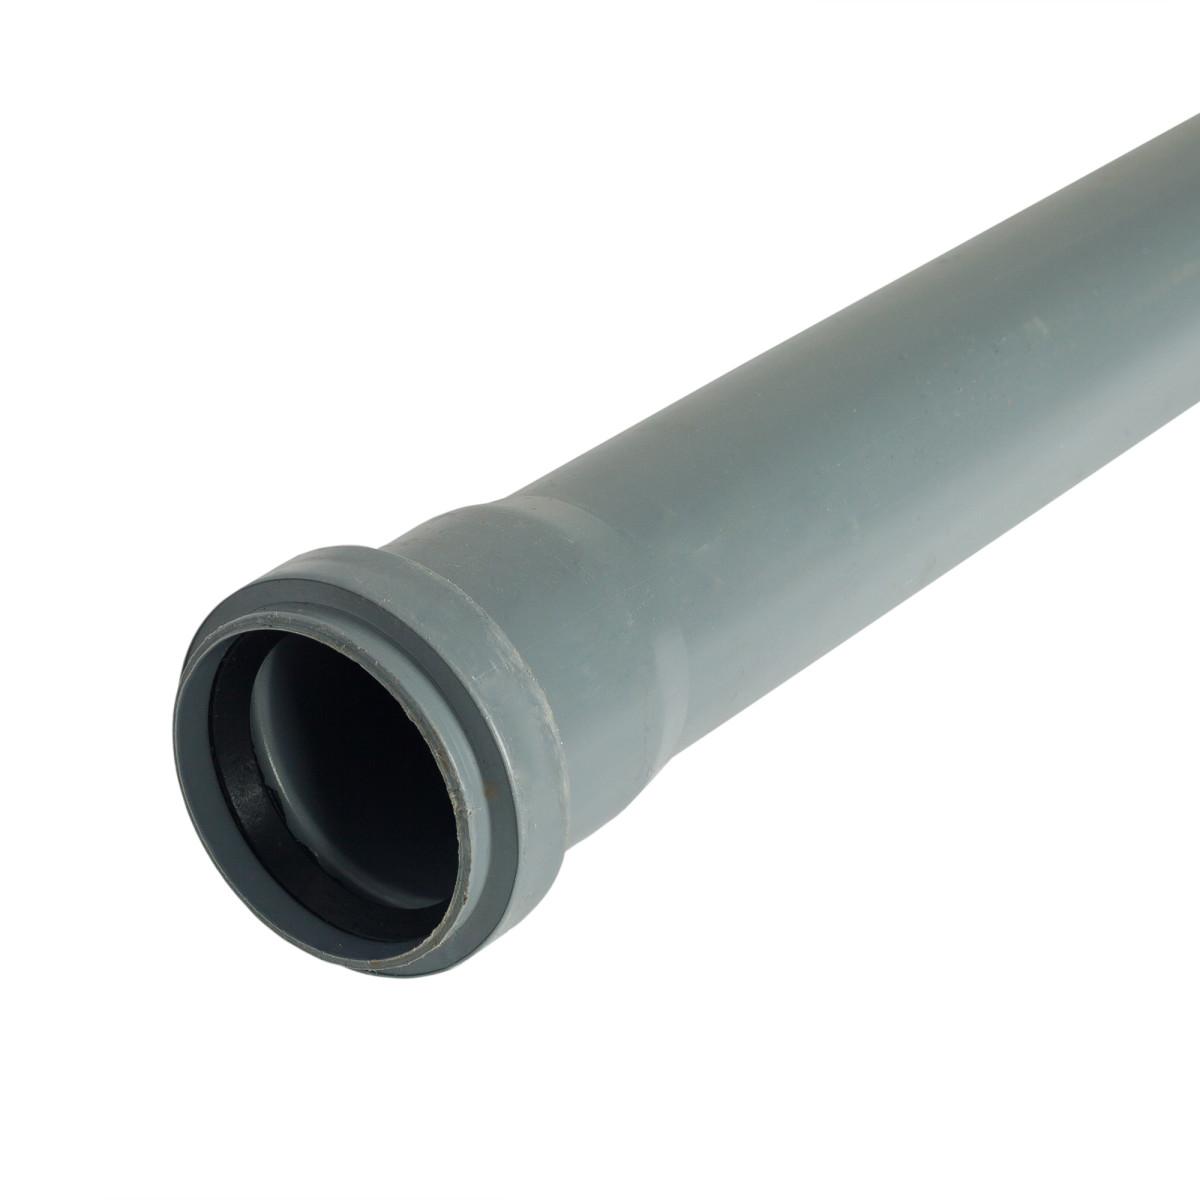 Труба канализационная D 50 мм L 3м полипропилен